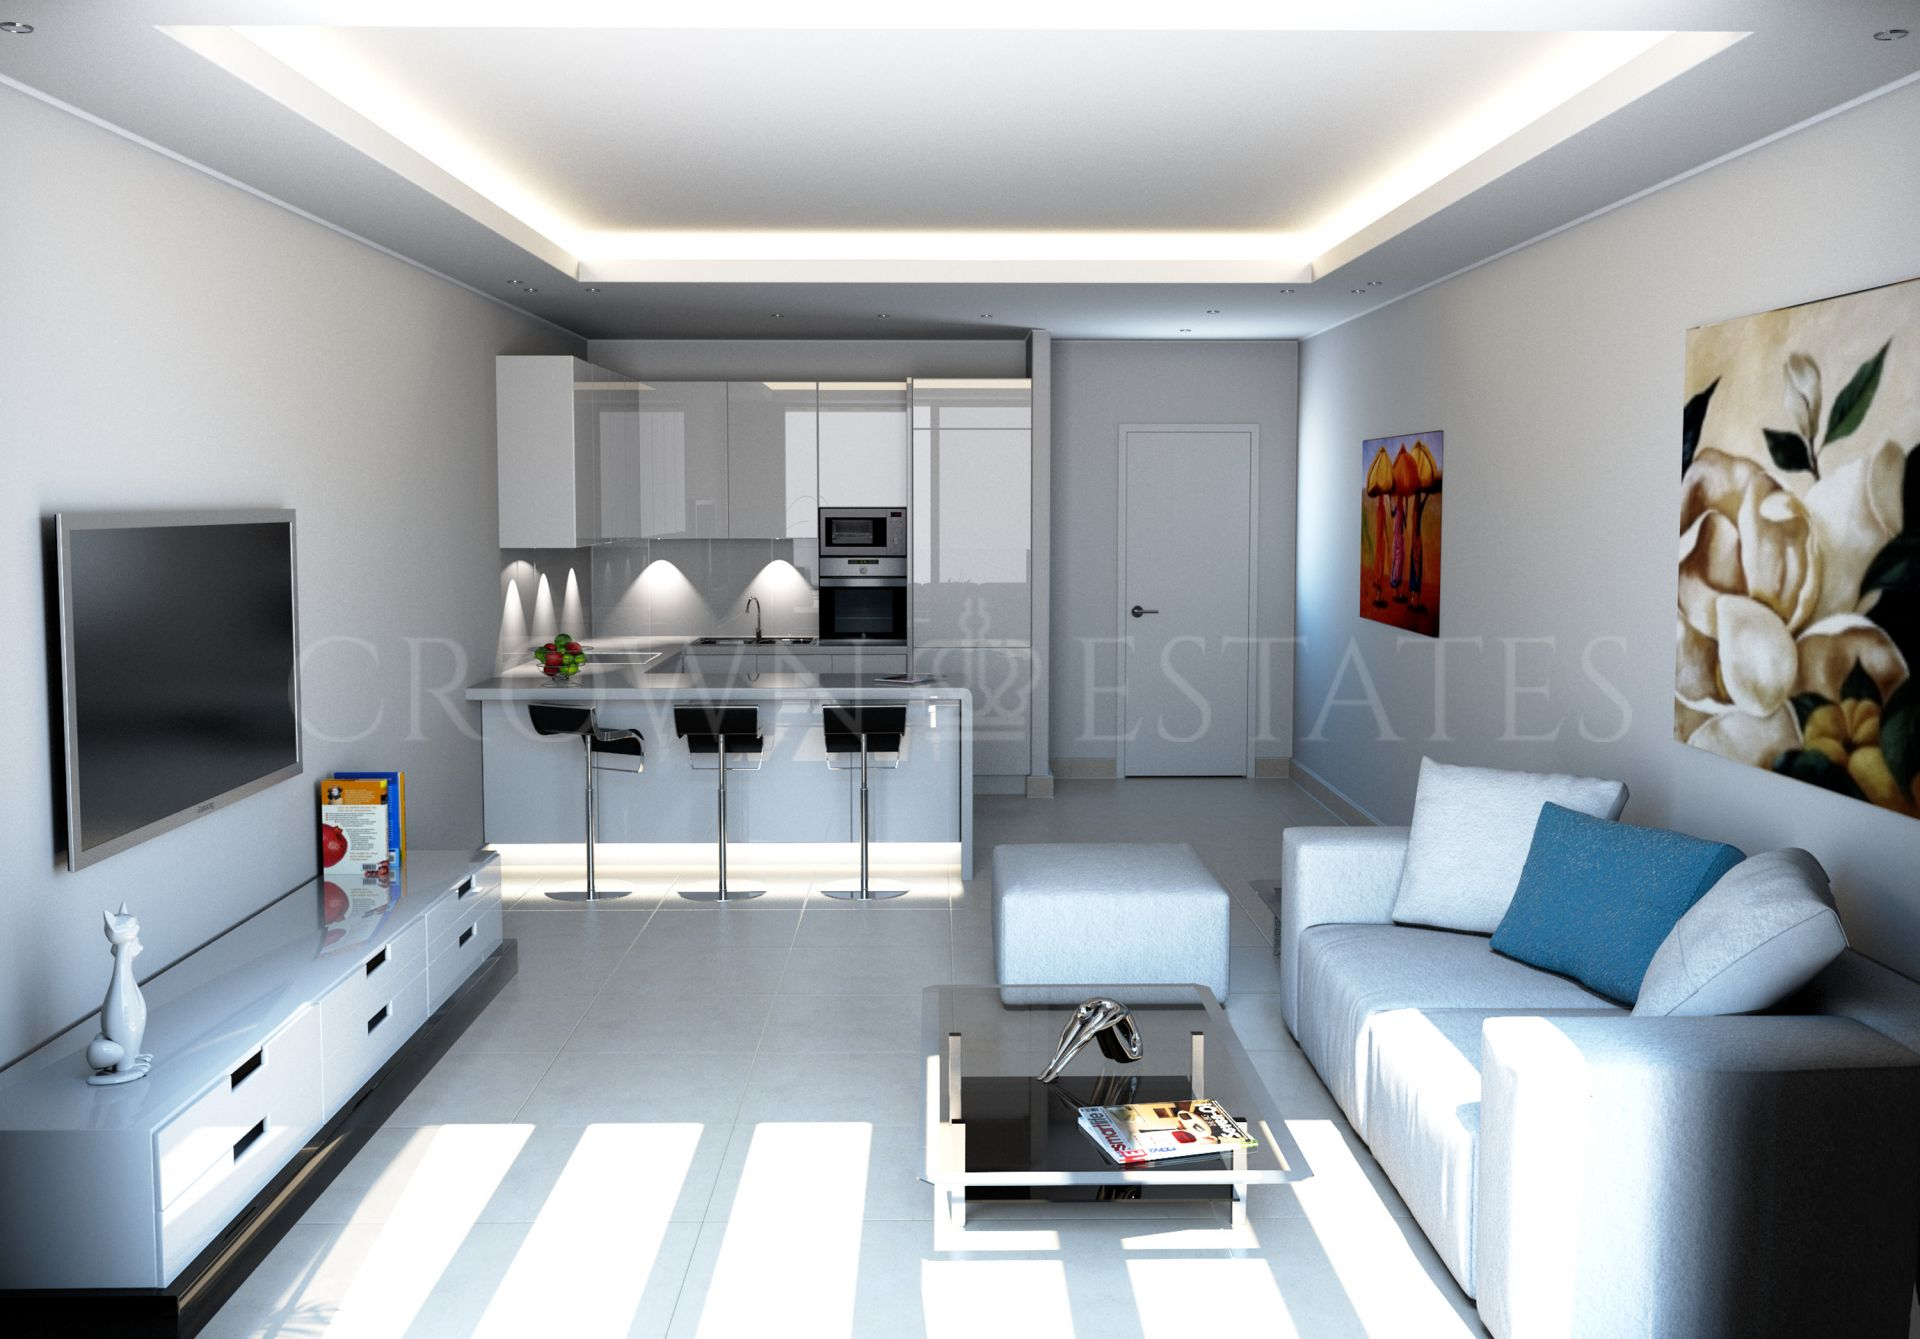 Apartment for sale in Cerros del Aguila, Mijas Costa